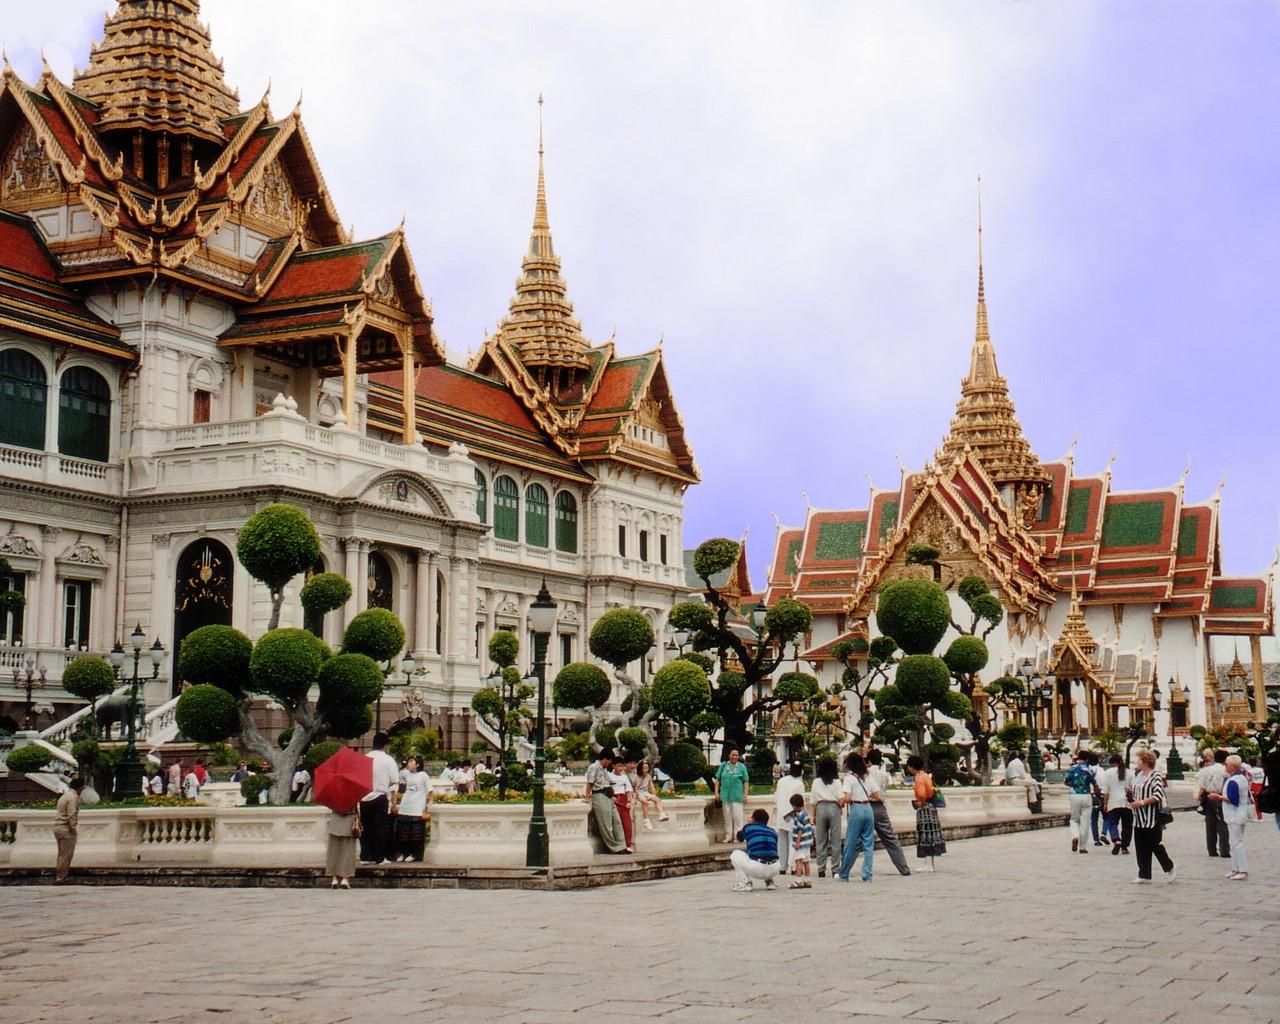 http://www.travelkris.com/wall/Thailand1280.jpg